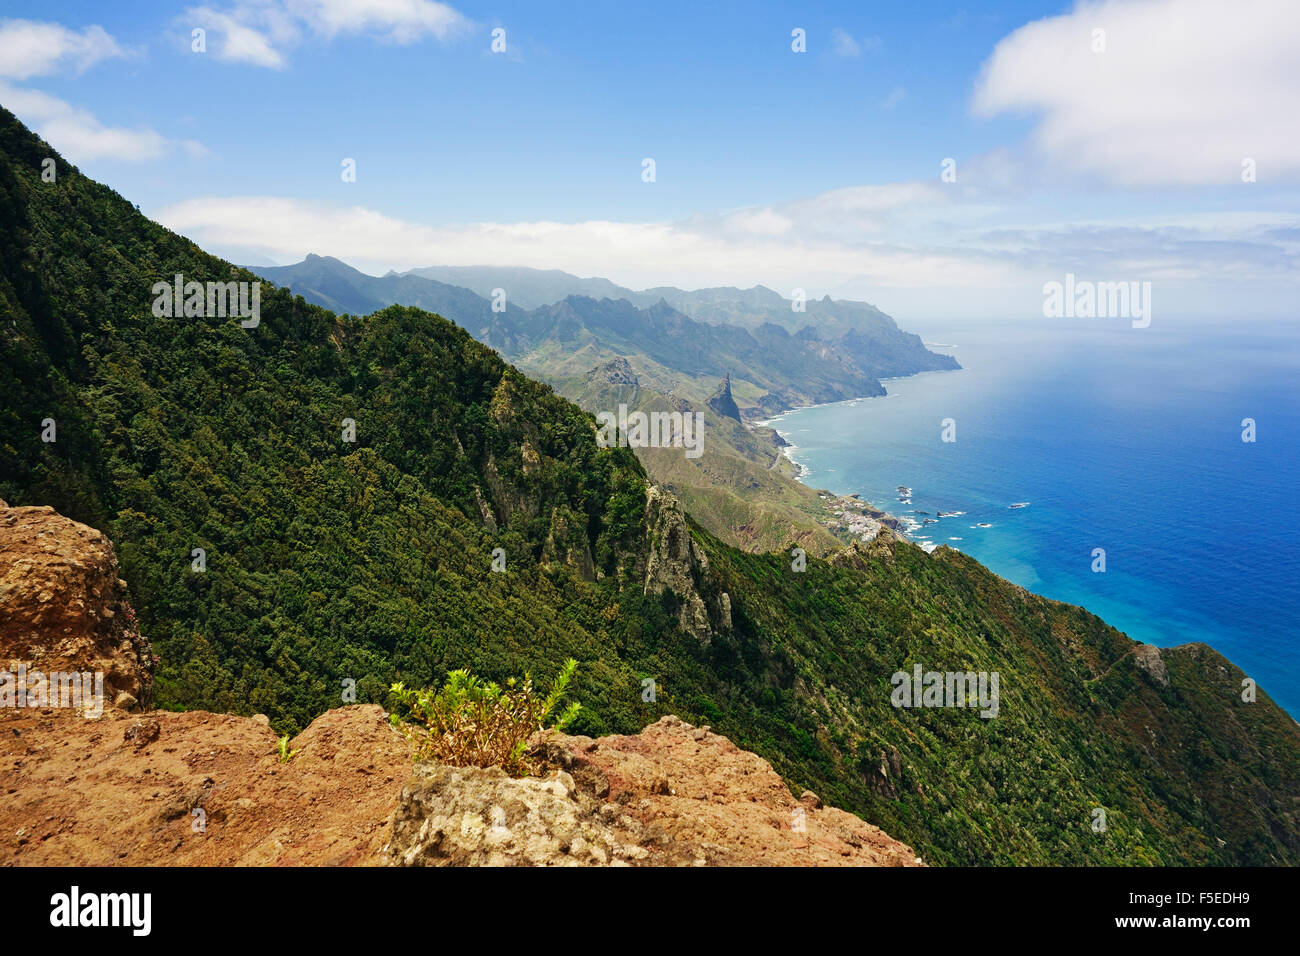 Anaga Mountains and Costa Adeje, Tenerife, Canary Islands, Spain, Atlantic, Europe - Stock Image